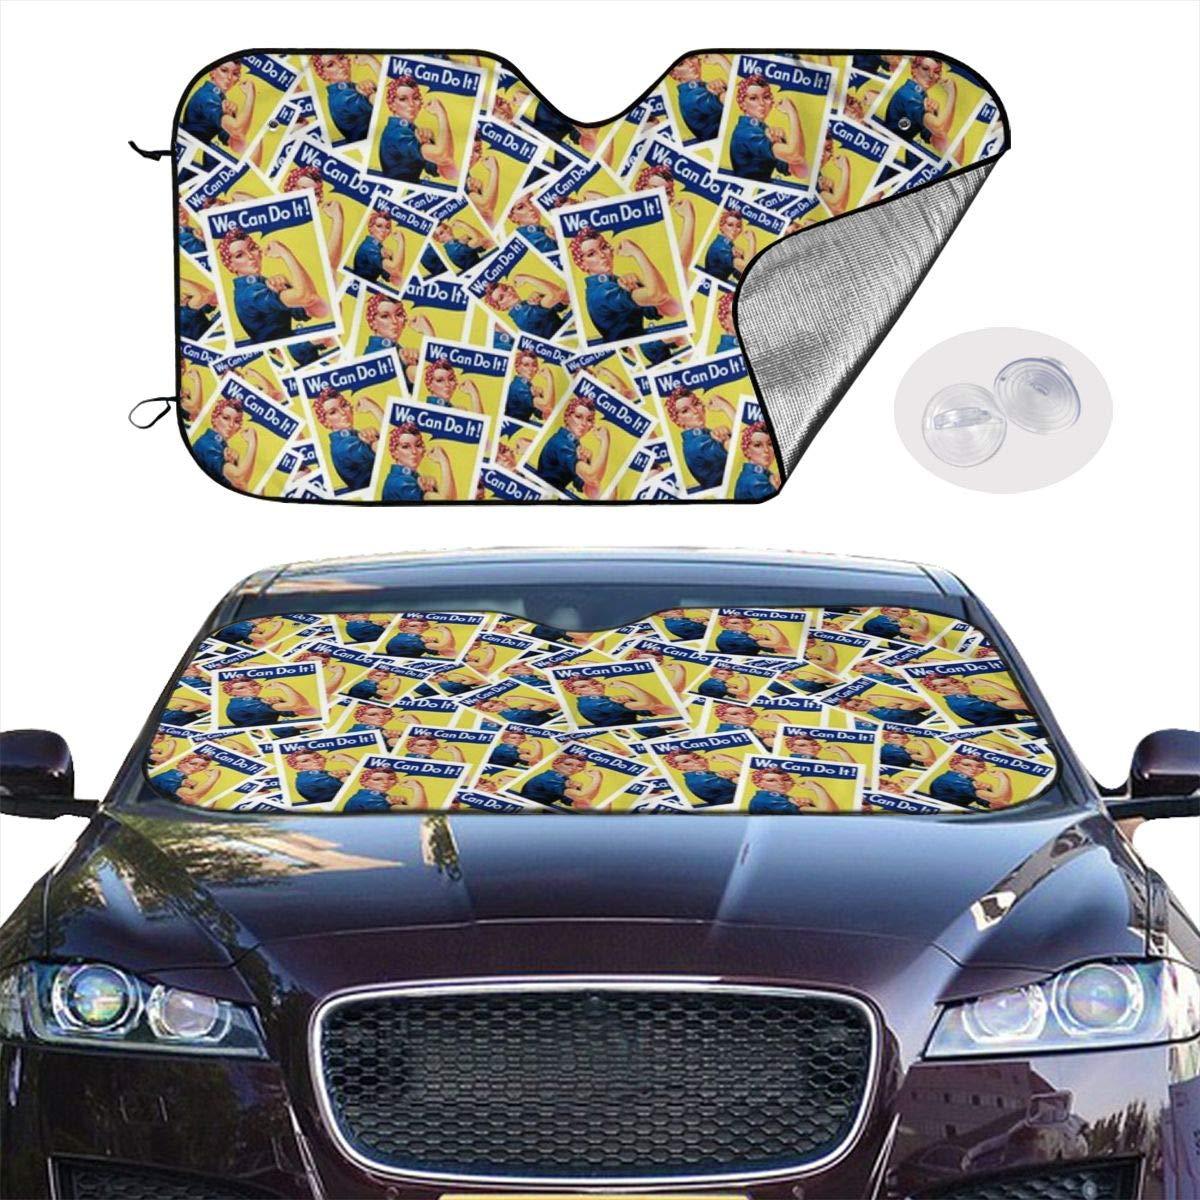 YJMHstore Mountain Universal Car Sunshades Heat Shield Windshield 2 Sizes